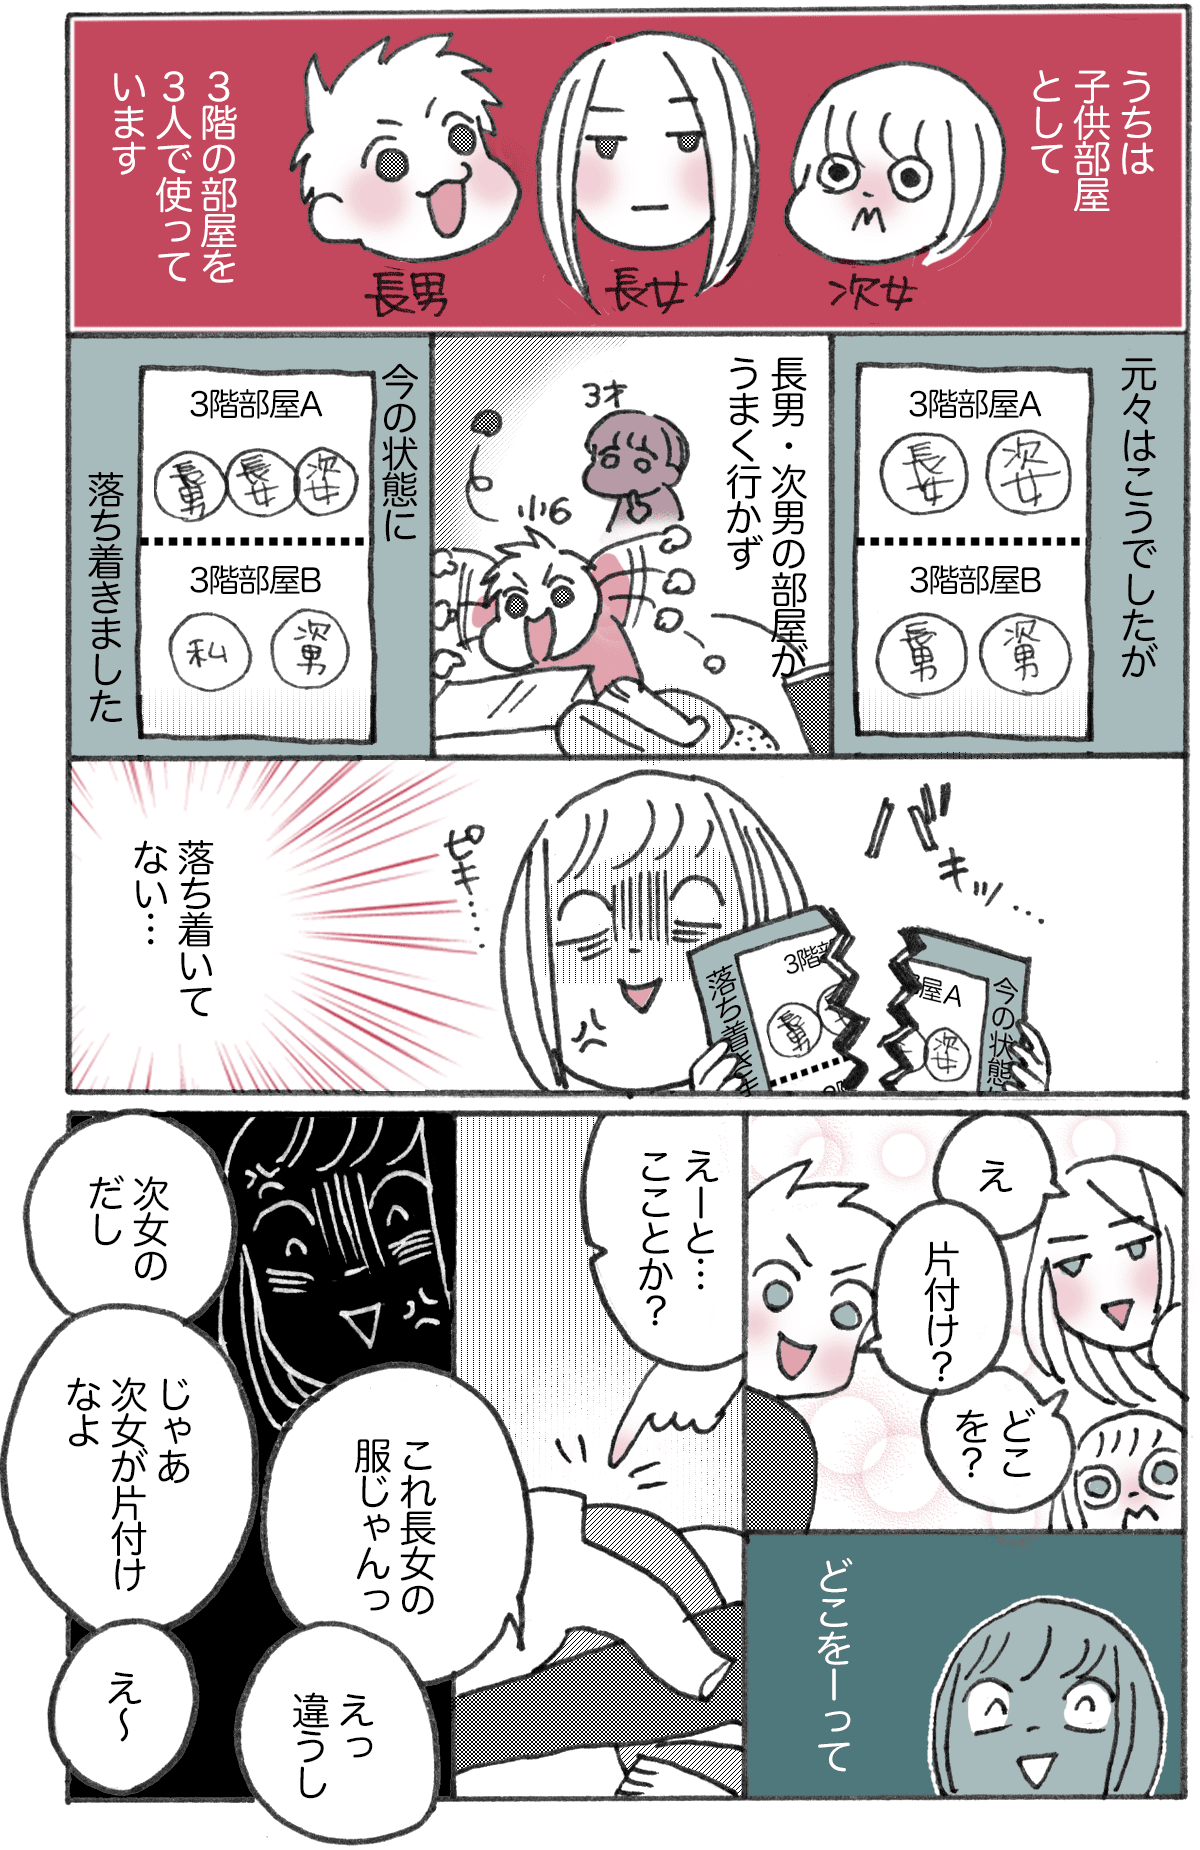 MK4_02